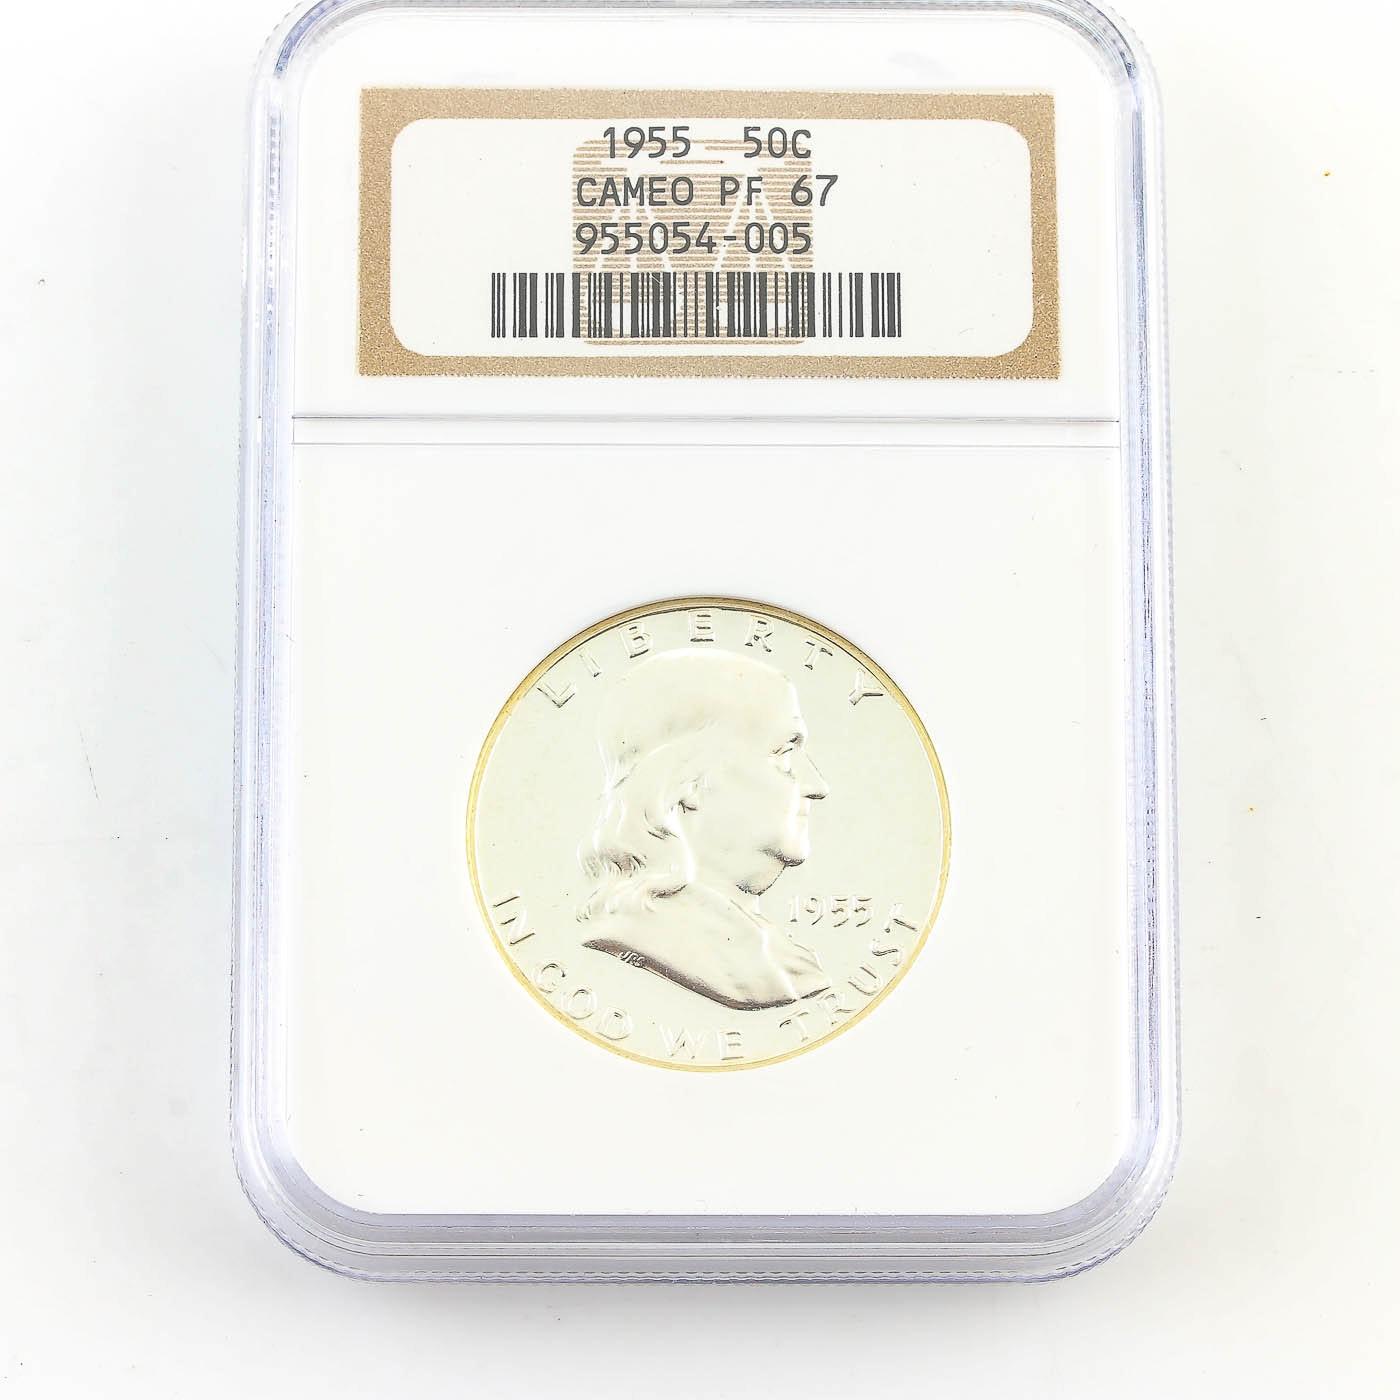 NGC Graded PF67 Cameo 1955 Franklin Silver Half Dollar